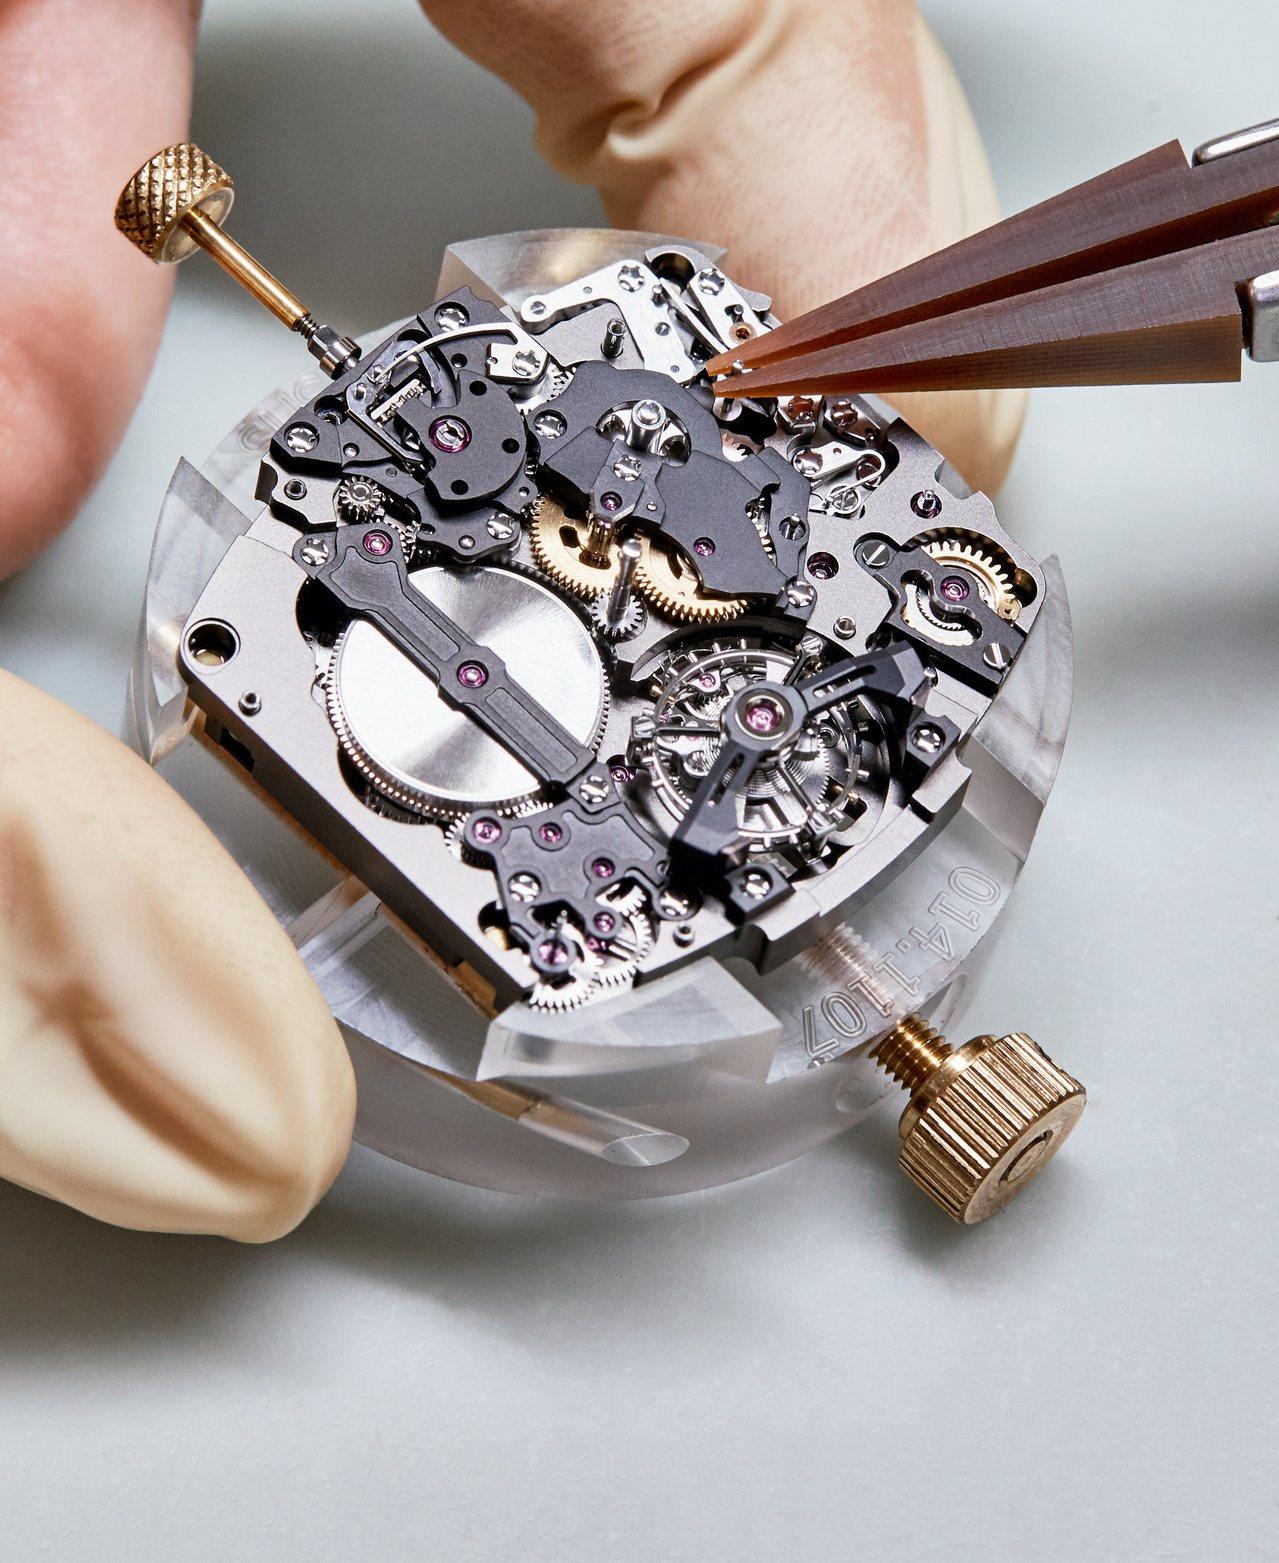 RICHARD MILLE為了RM 62-01 ACJ陀飛輪振動鬧鈴腕表打造了全...